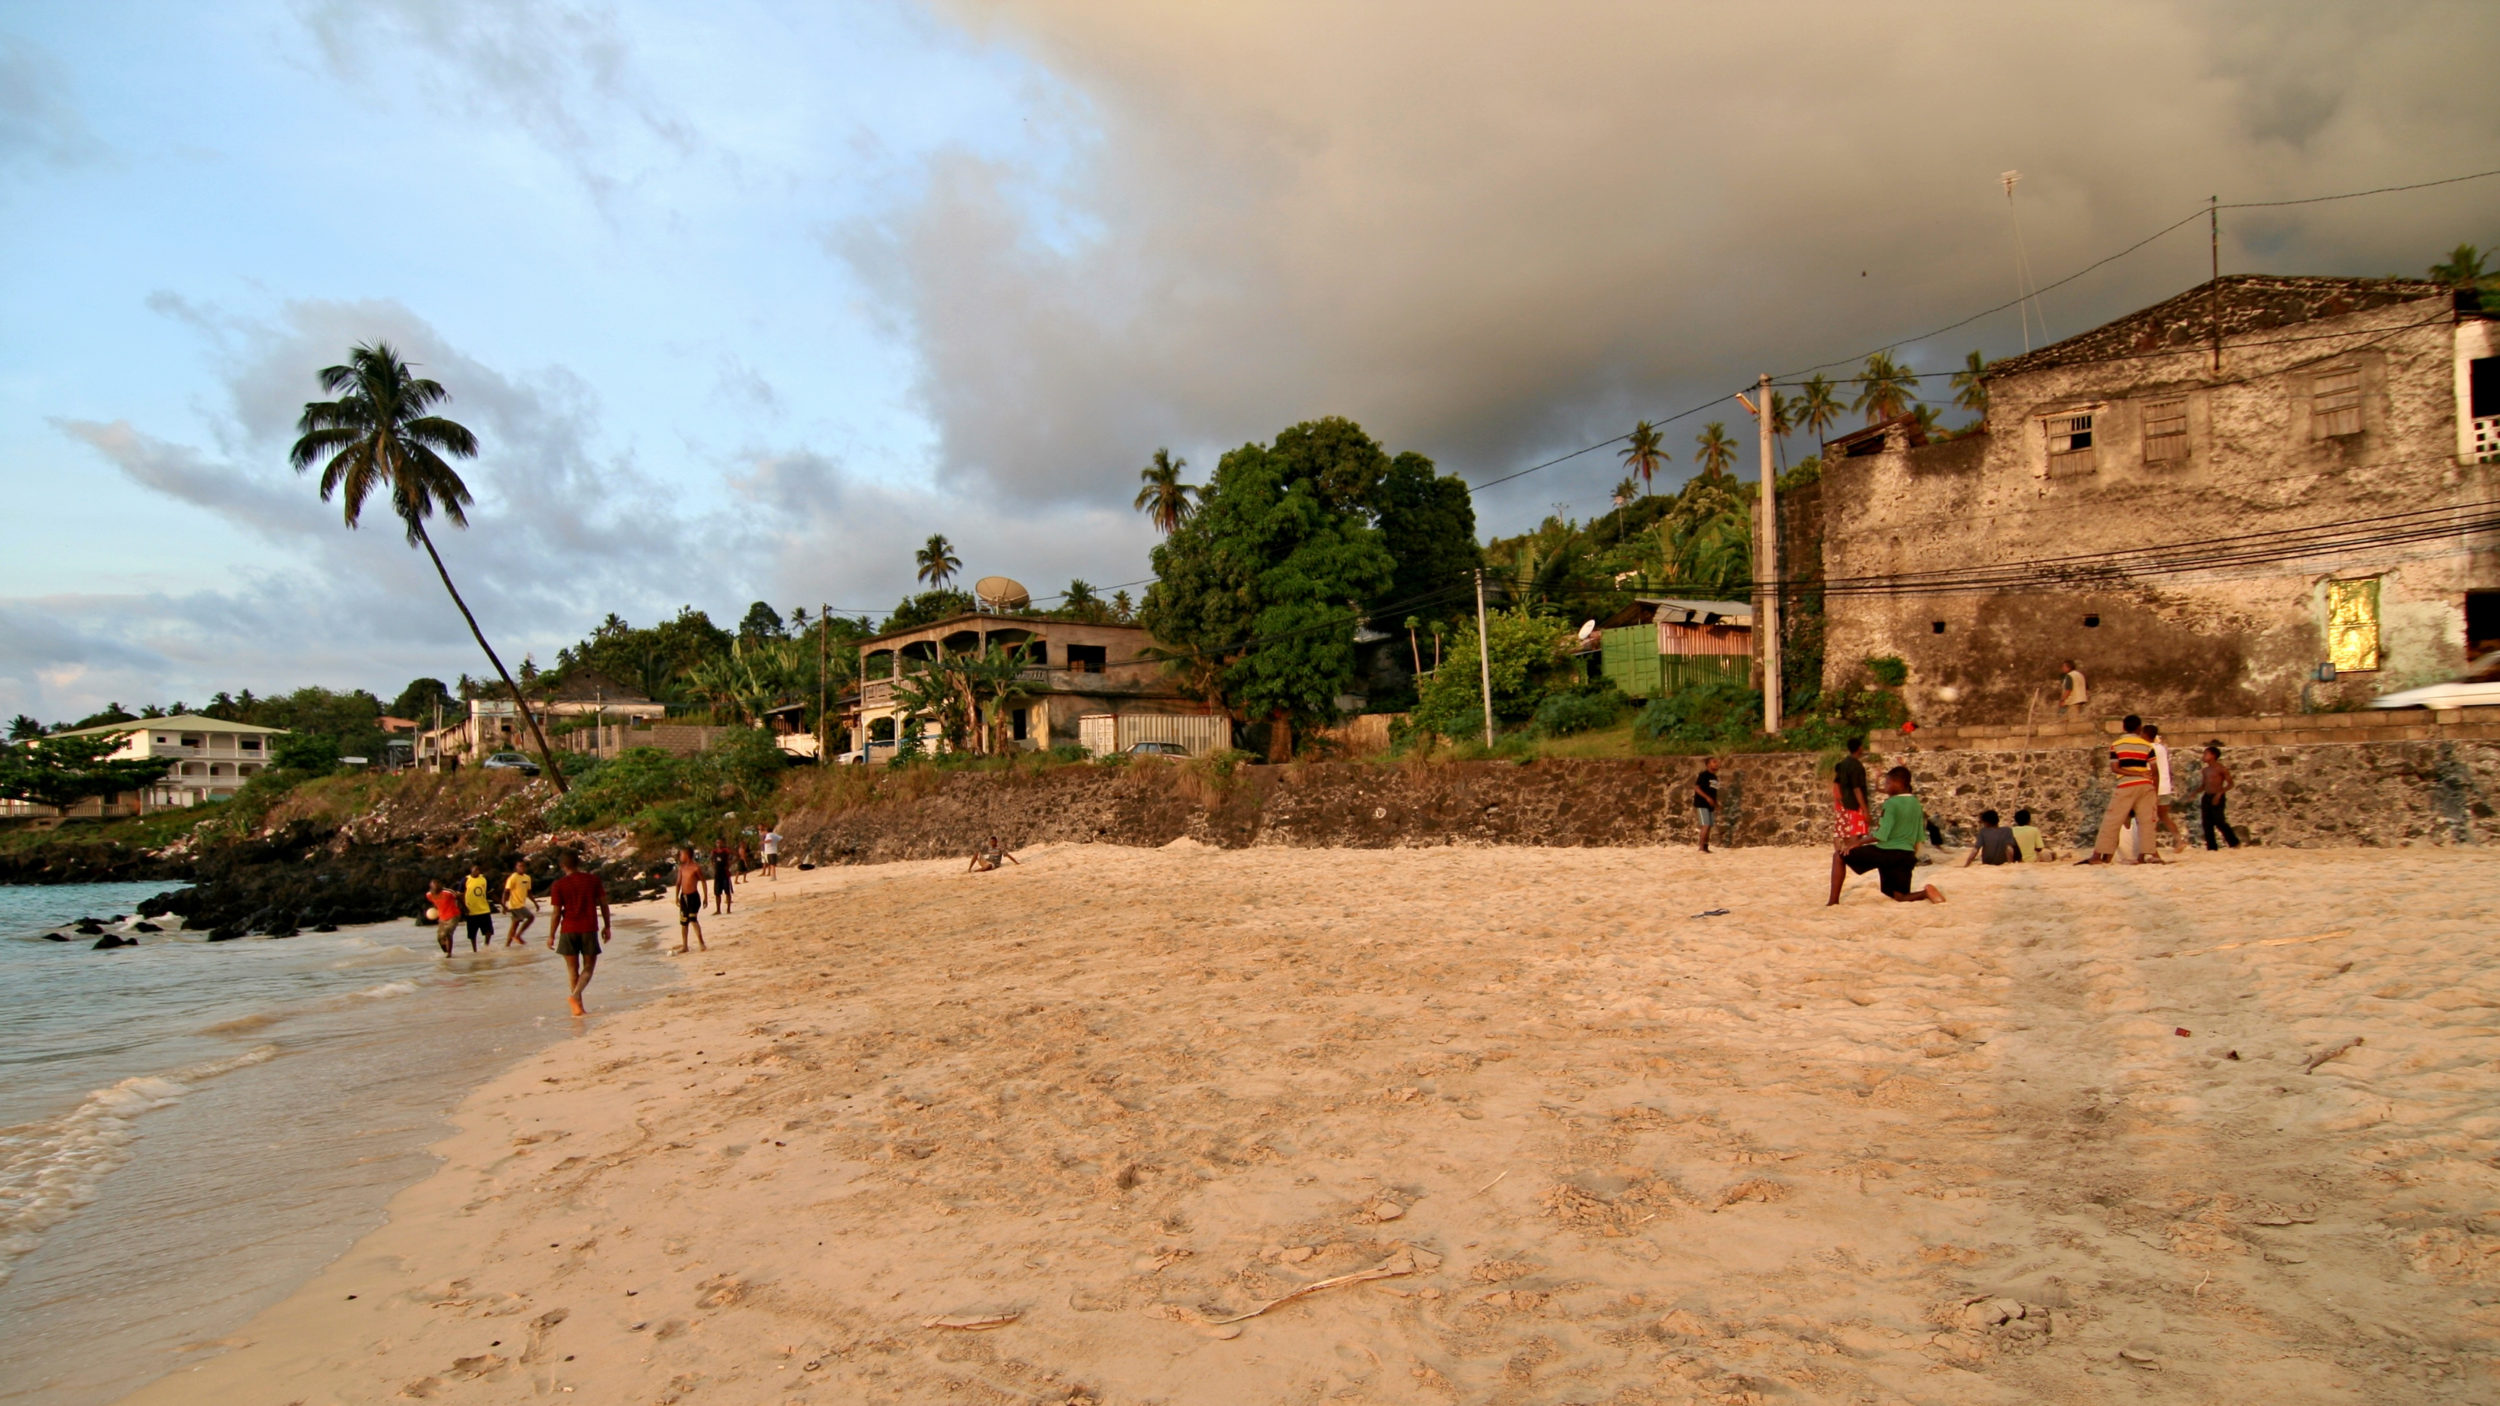 Comoros [shutterstock]